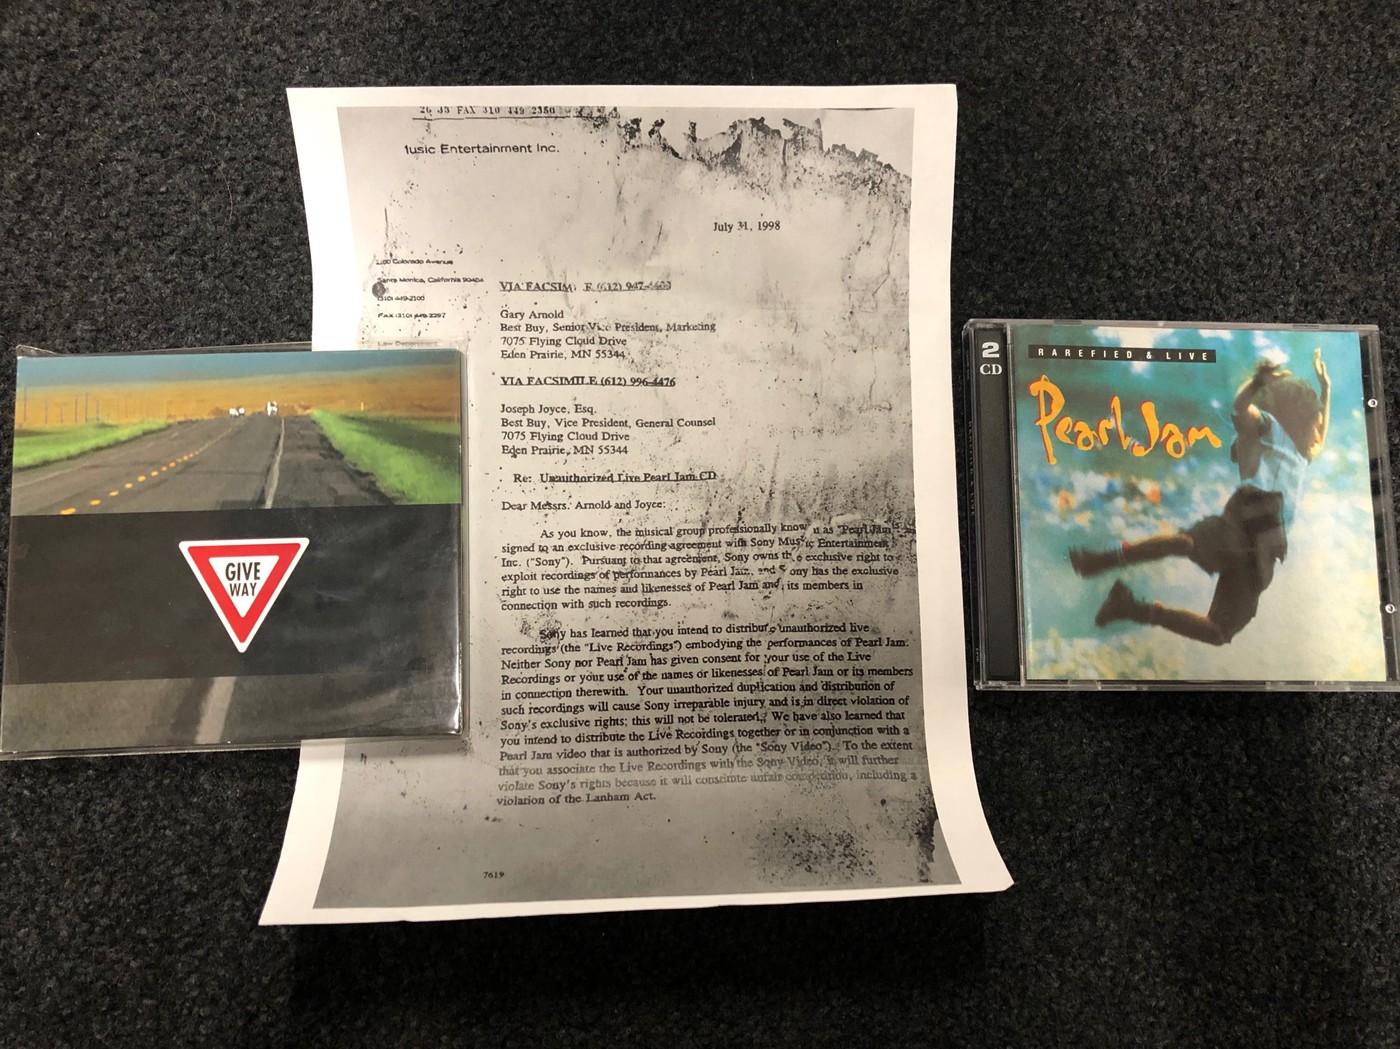 Pearl Jam Australia 1995 & 1998 Bootlegs 'Rarefied & Live' 'Give Way